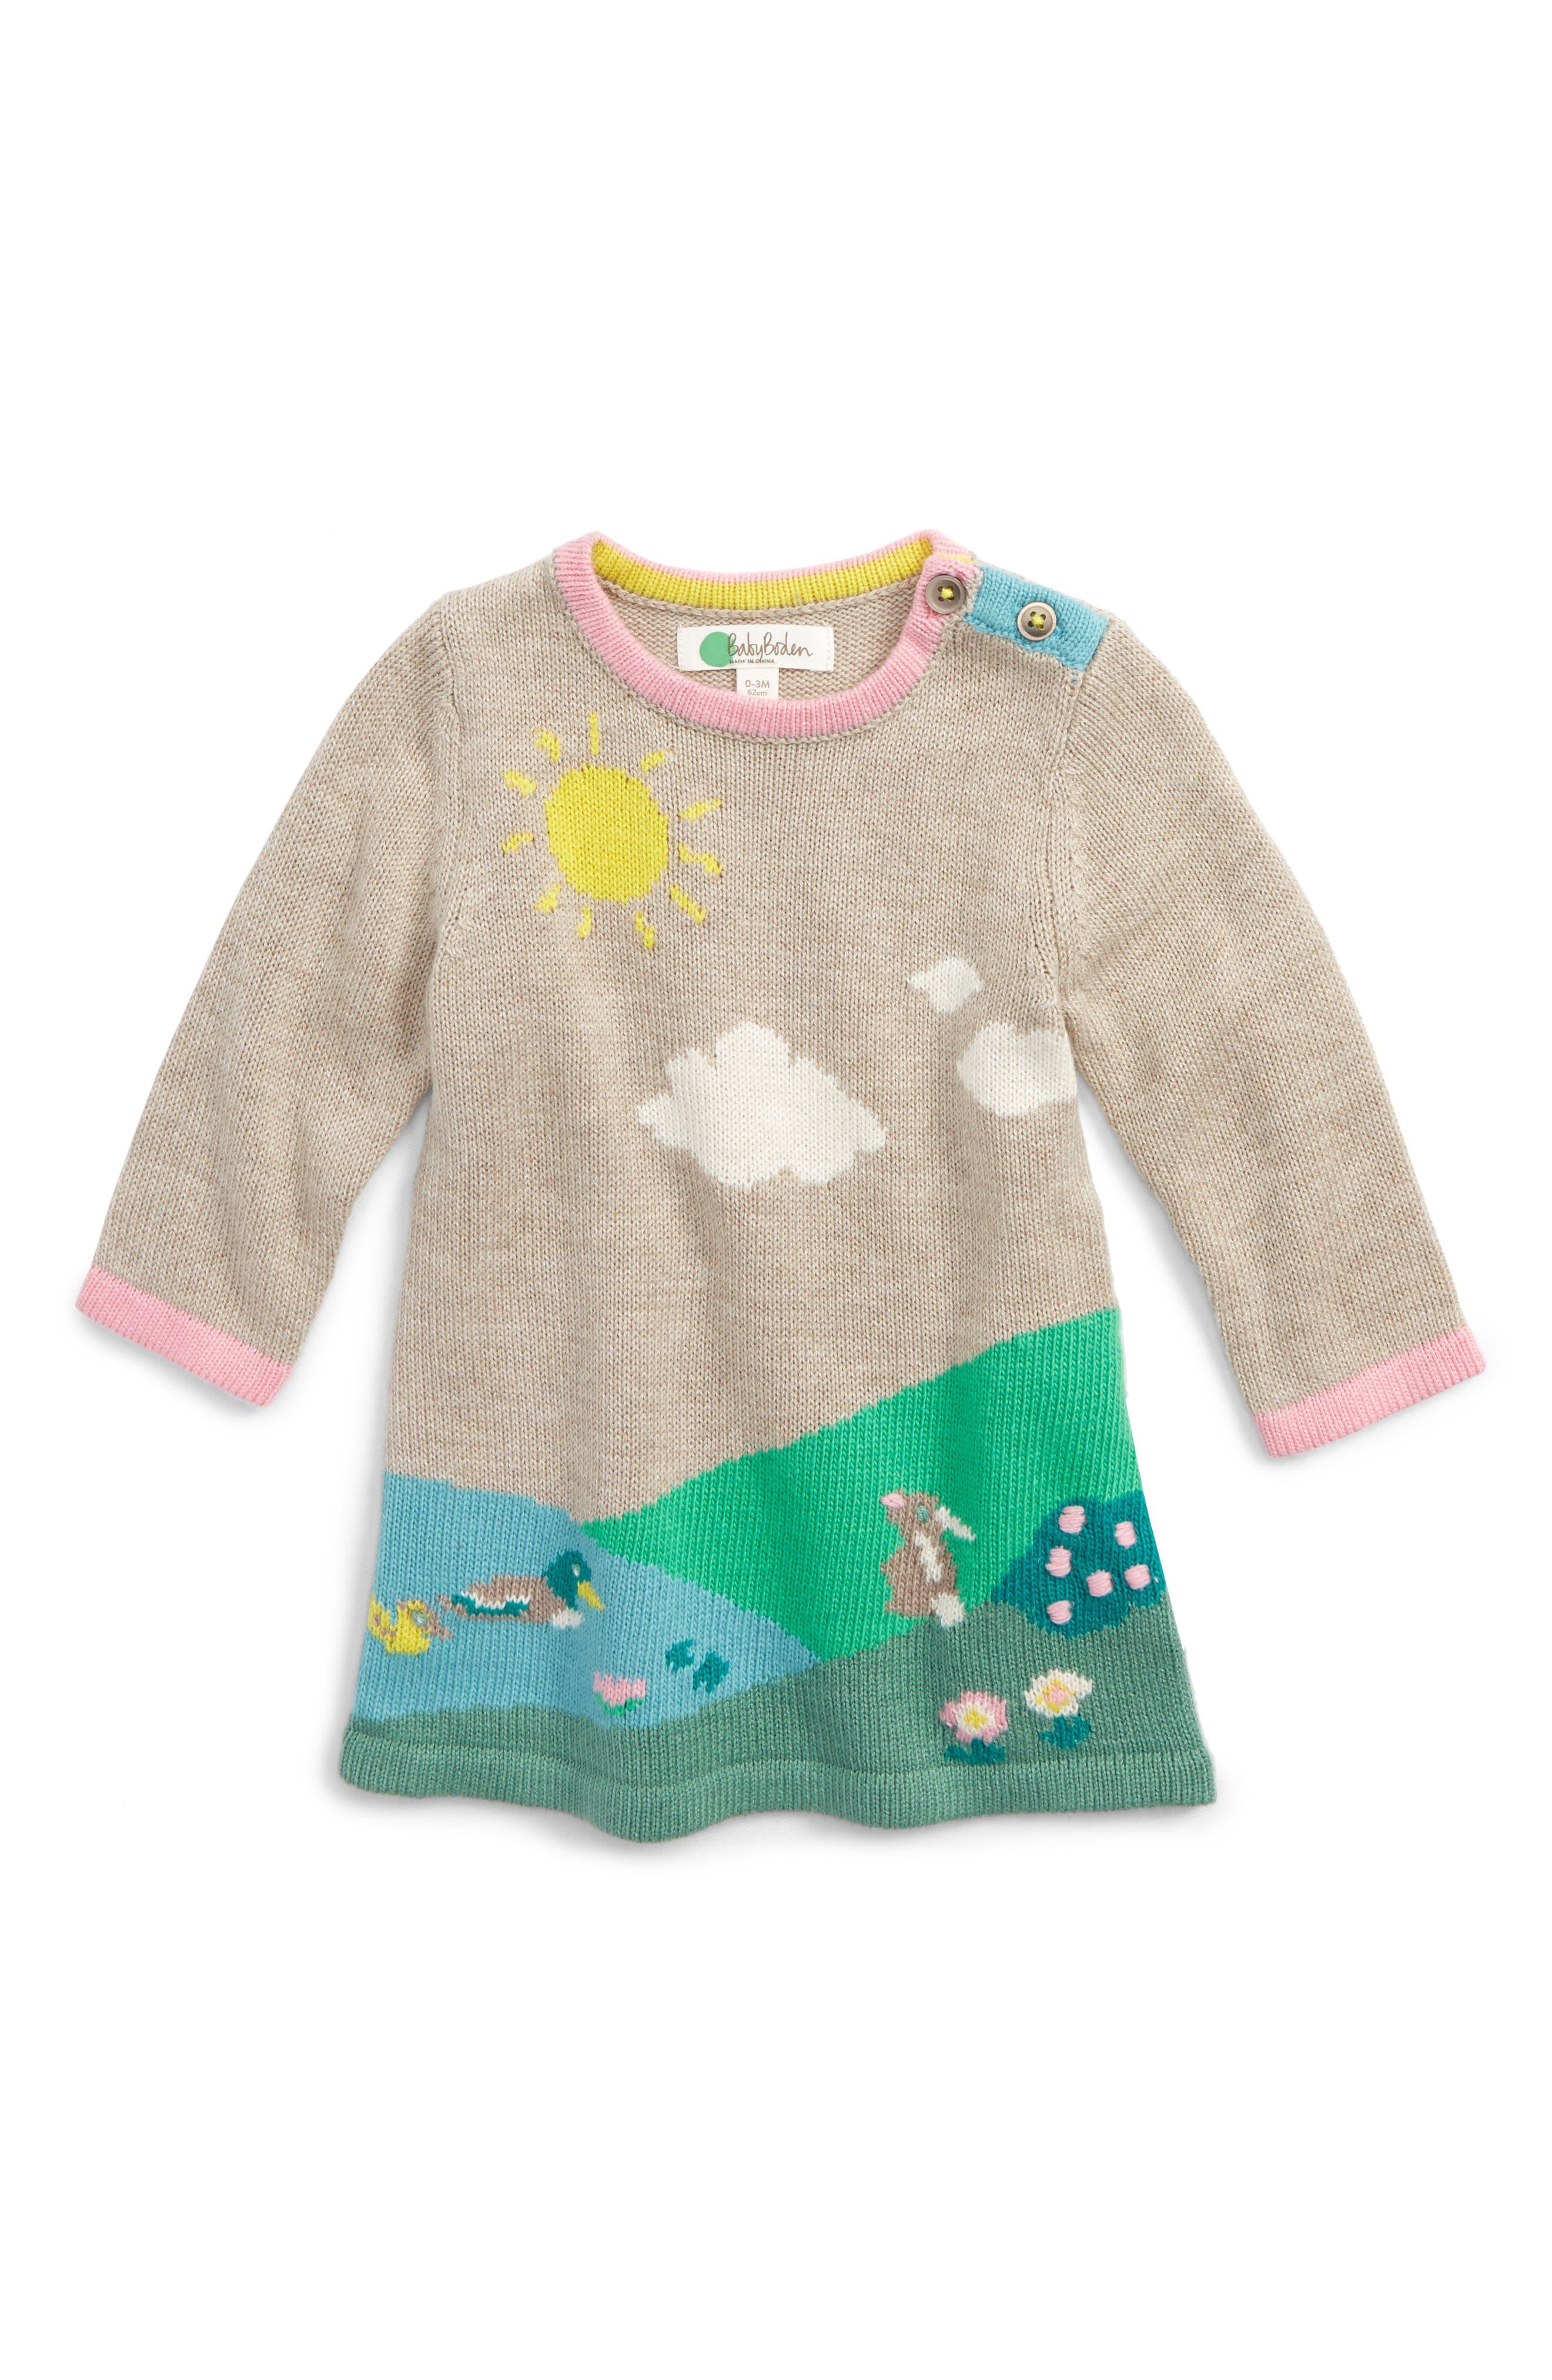 Main Image - Mini Boden River Bank Intarsia Knit Dress (Baby Girls & Toddler Girls)